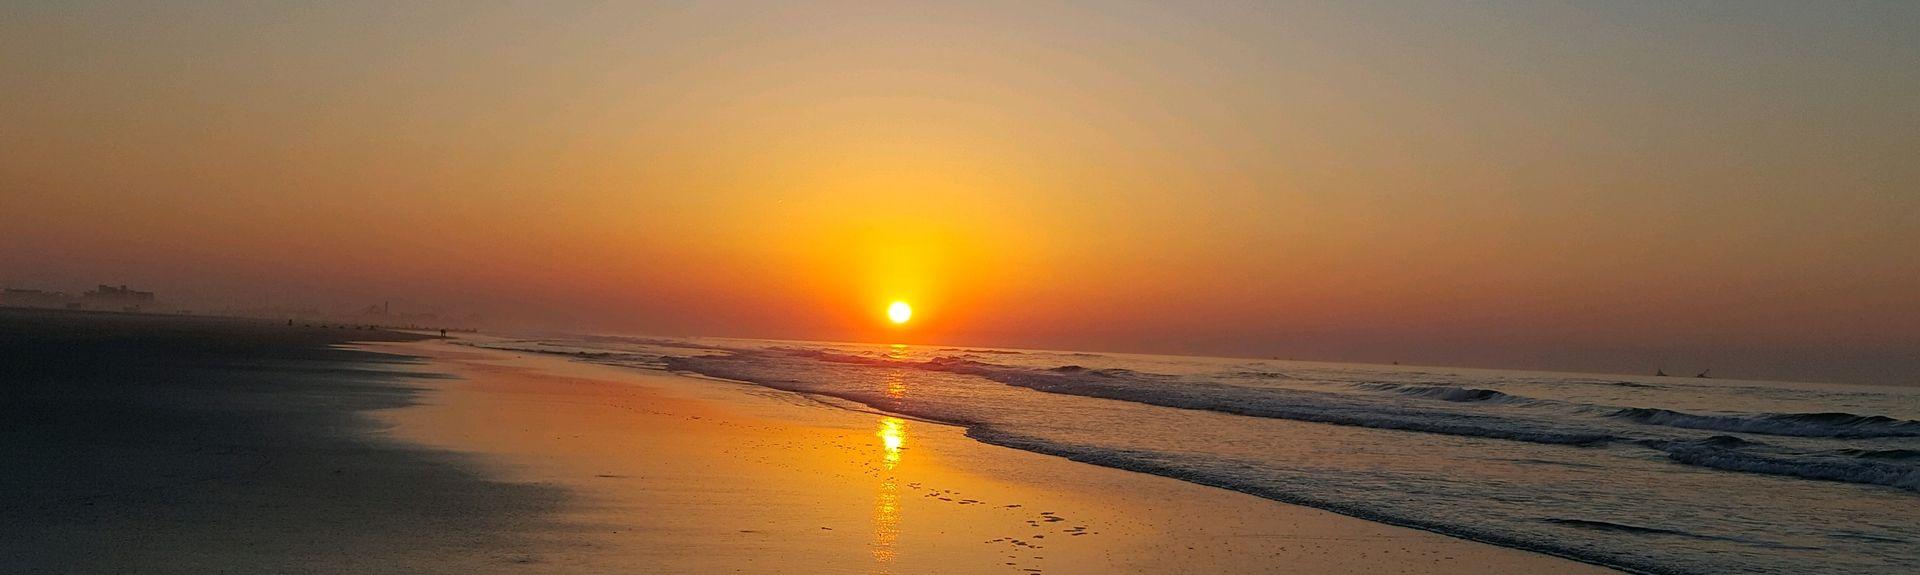 Summer Sands (Wildwood Crest, New Jersey, United States)